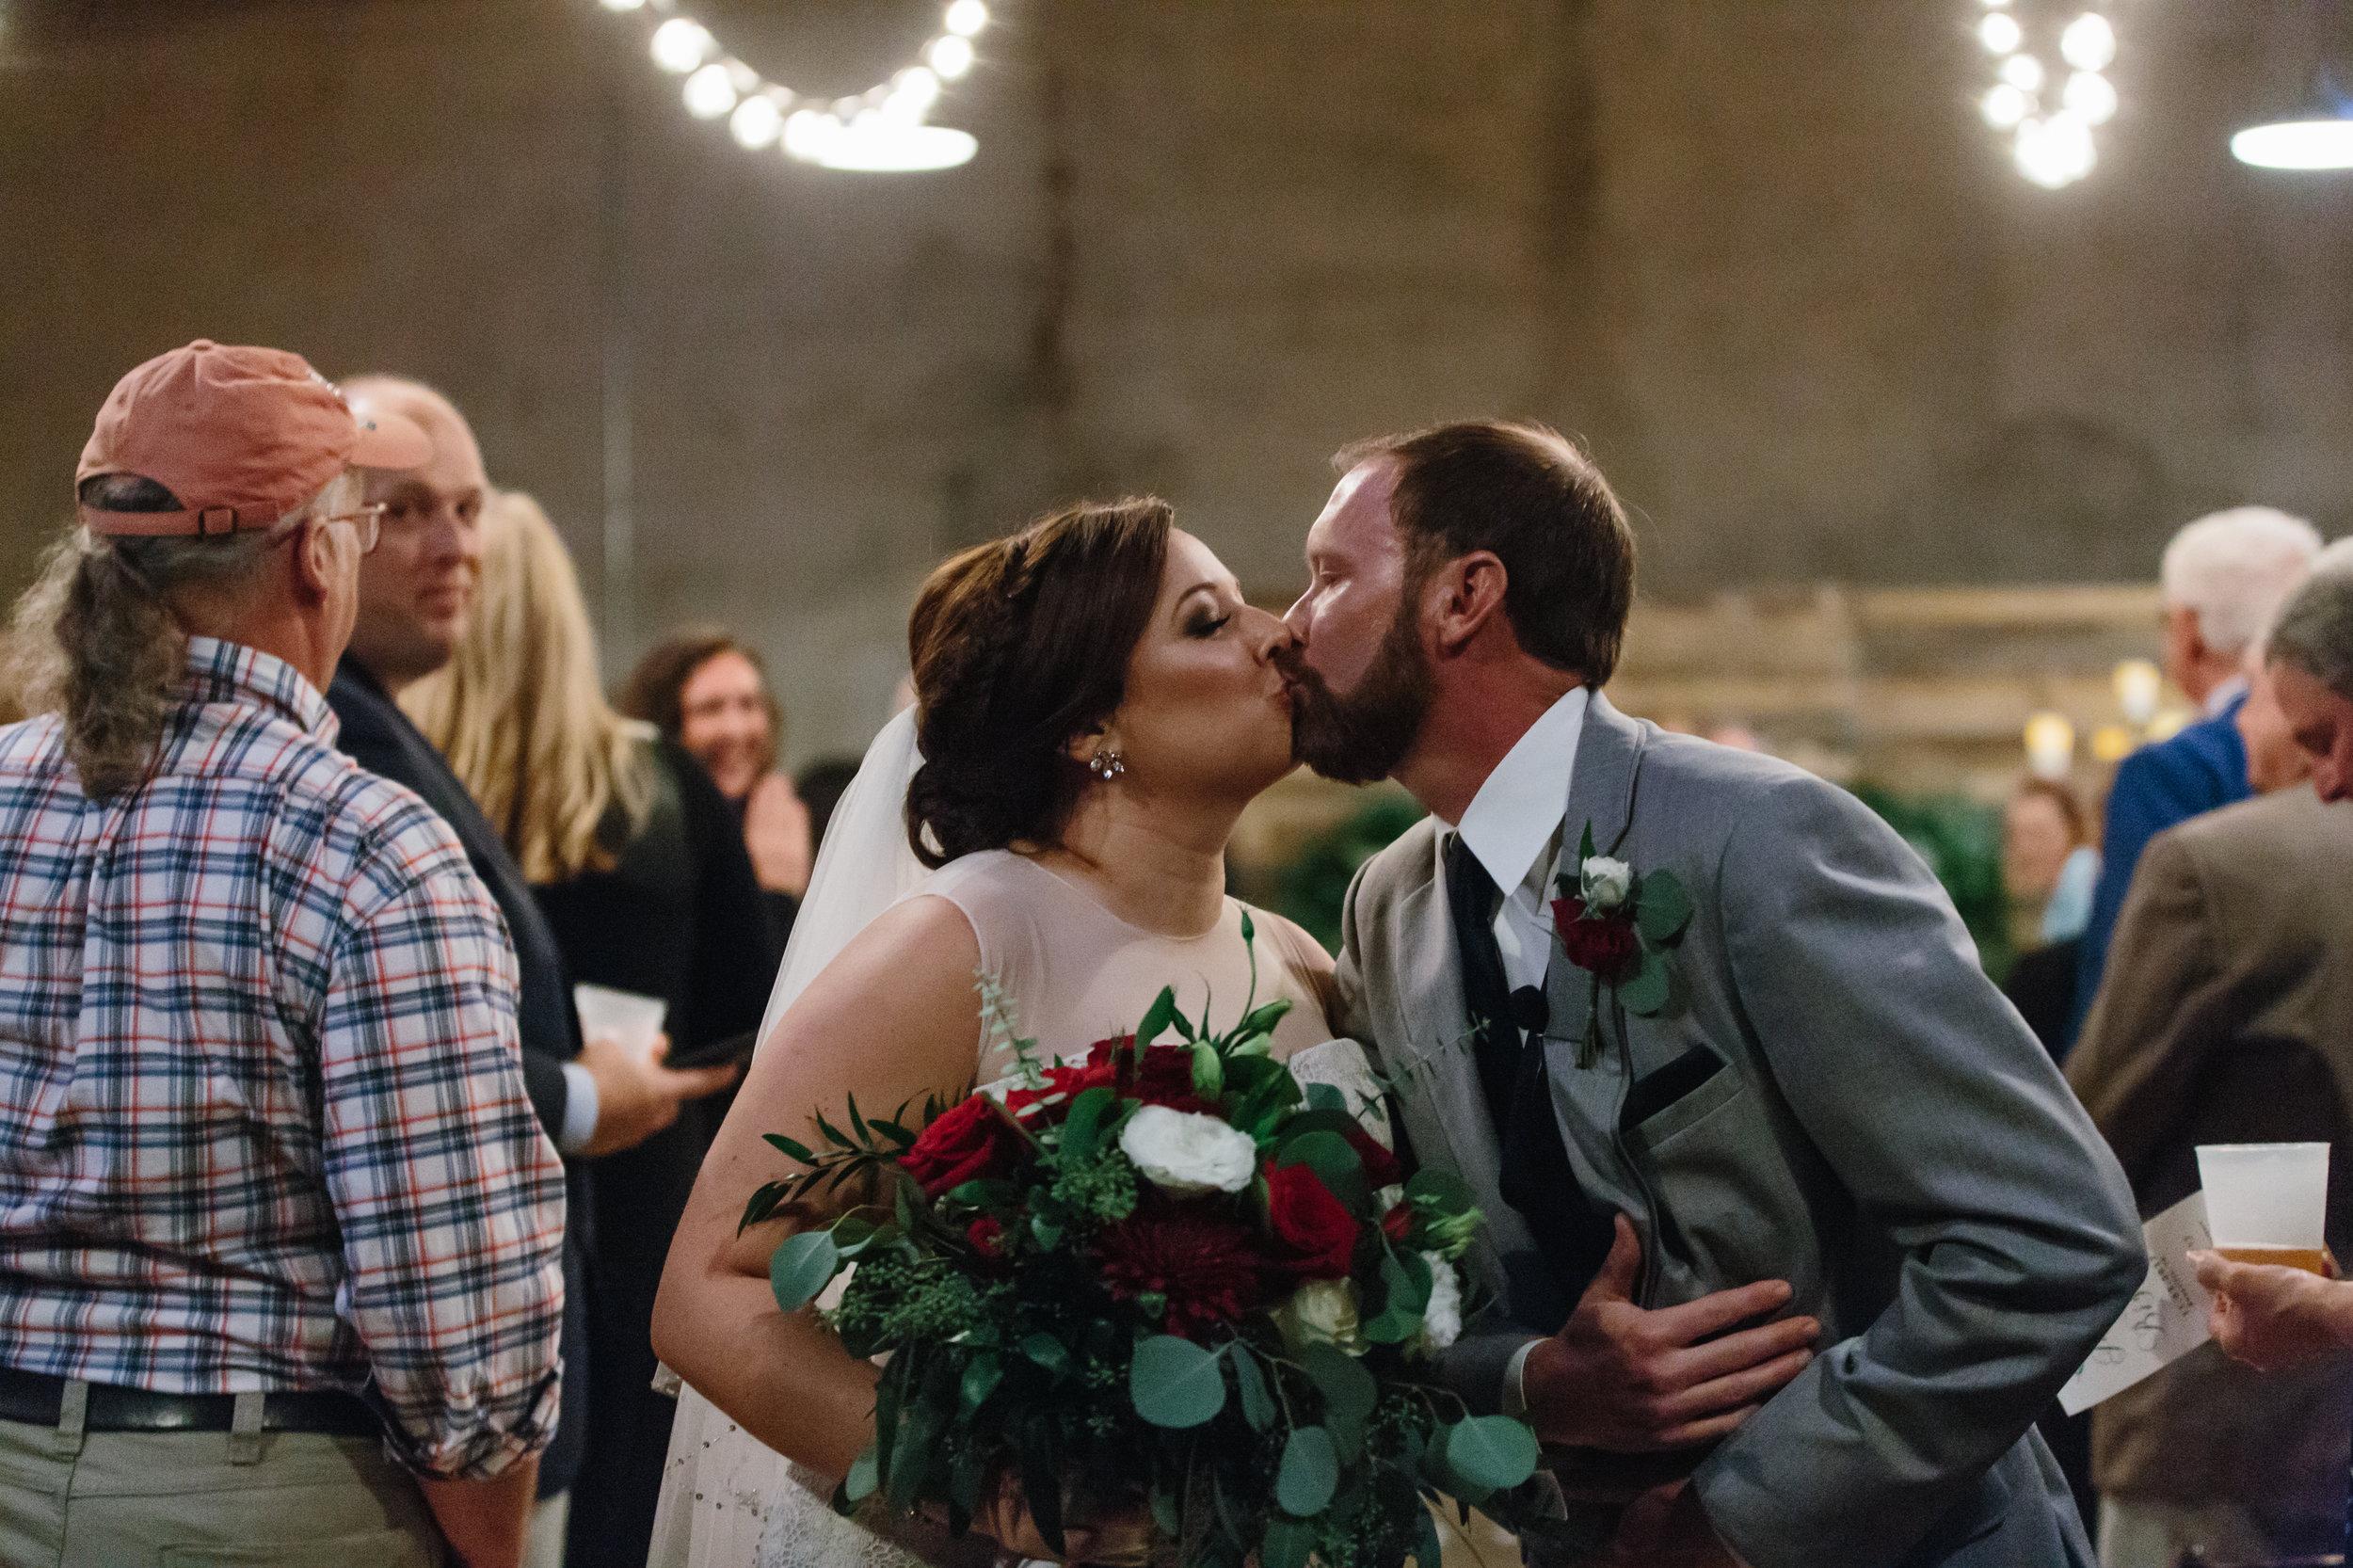 Jessica_Bryan_Wedding_Standard_Knoxville_Abigail_Malone_Photography-582.jpg